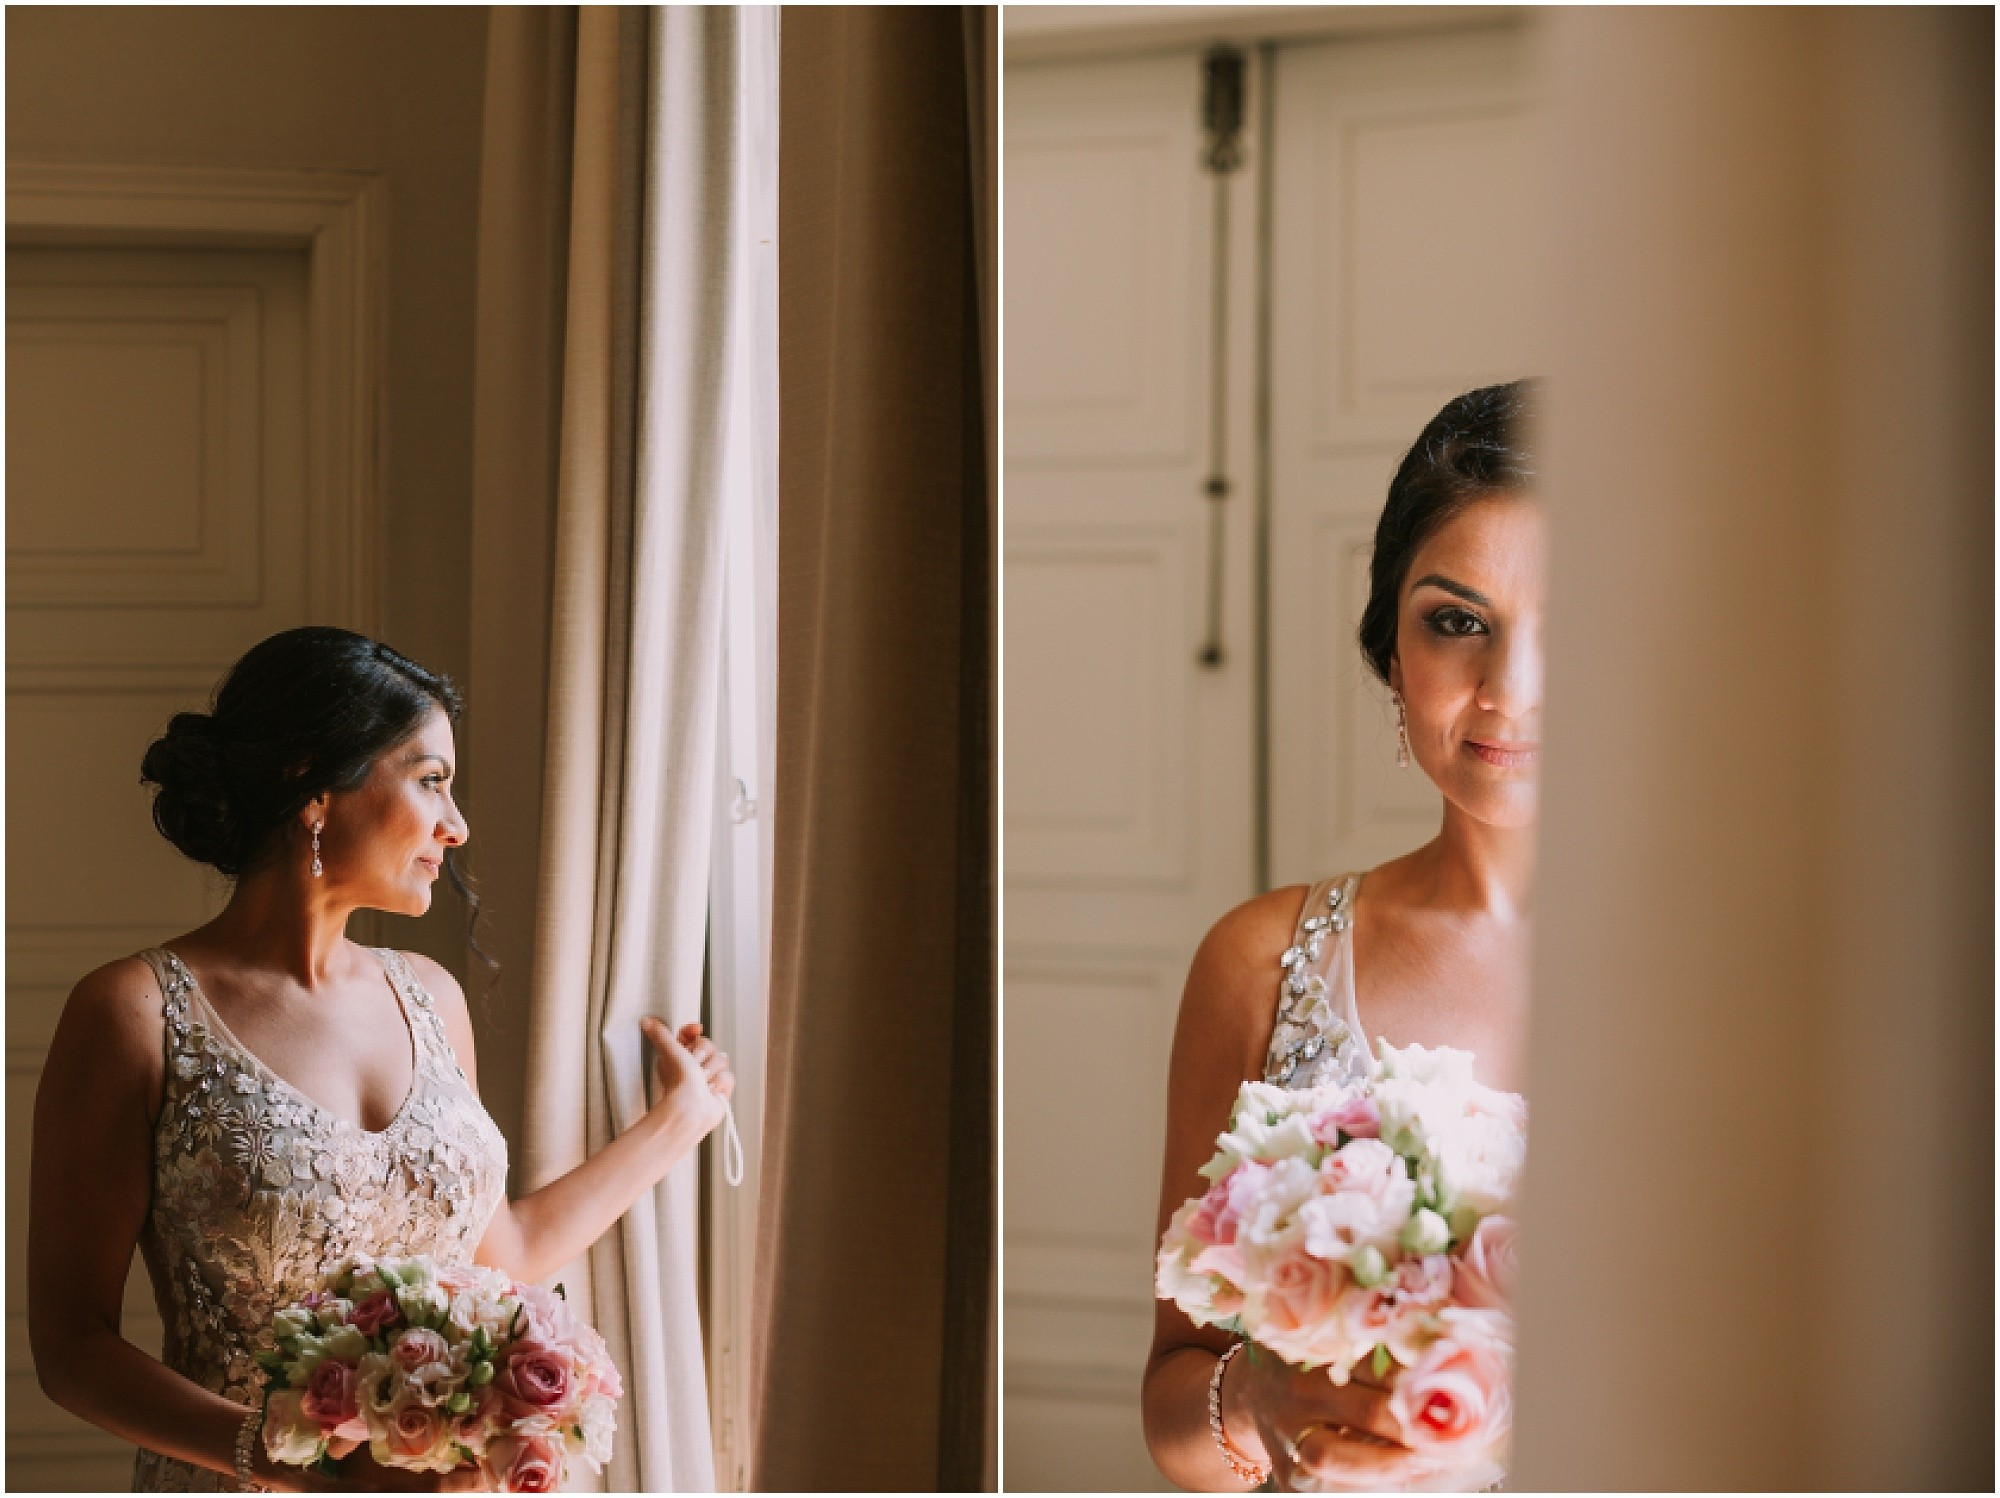 Kateryna-photos-photographer-mariage-chateau-saint-paterne-alencon-normandie-mayenne-le-mans_0012.jpg